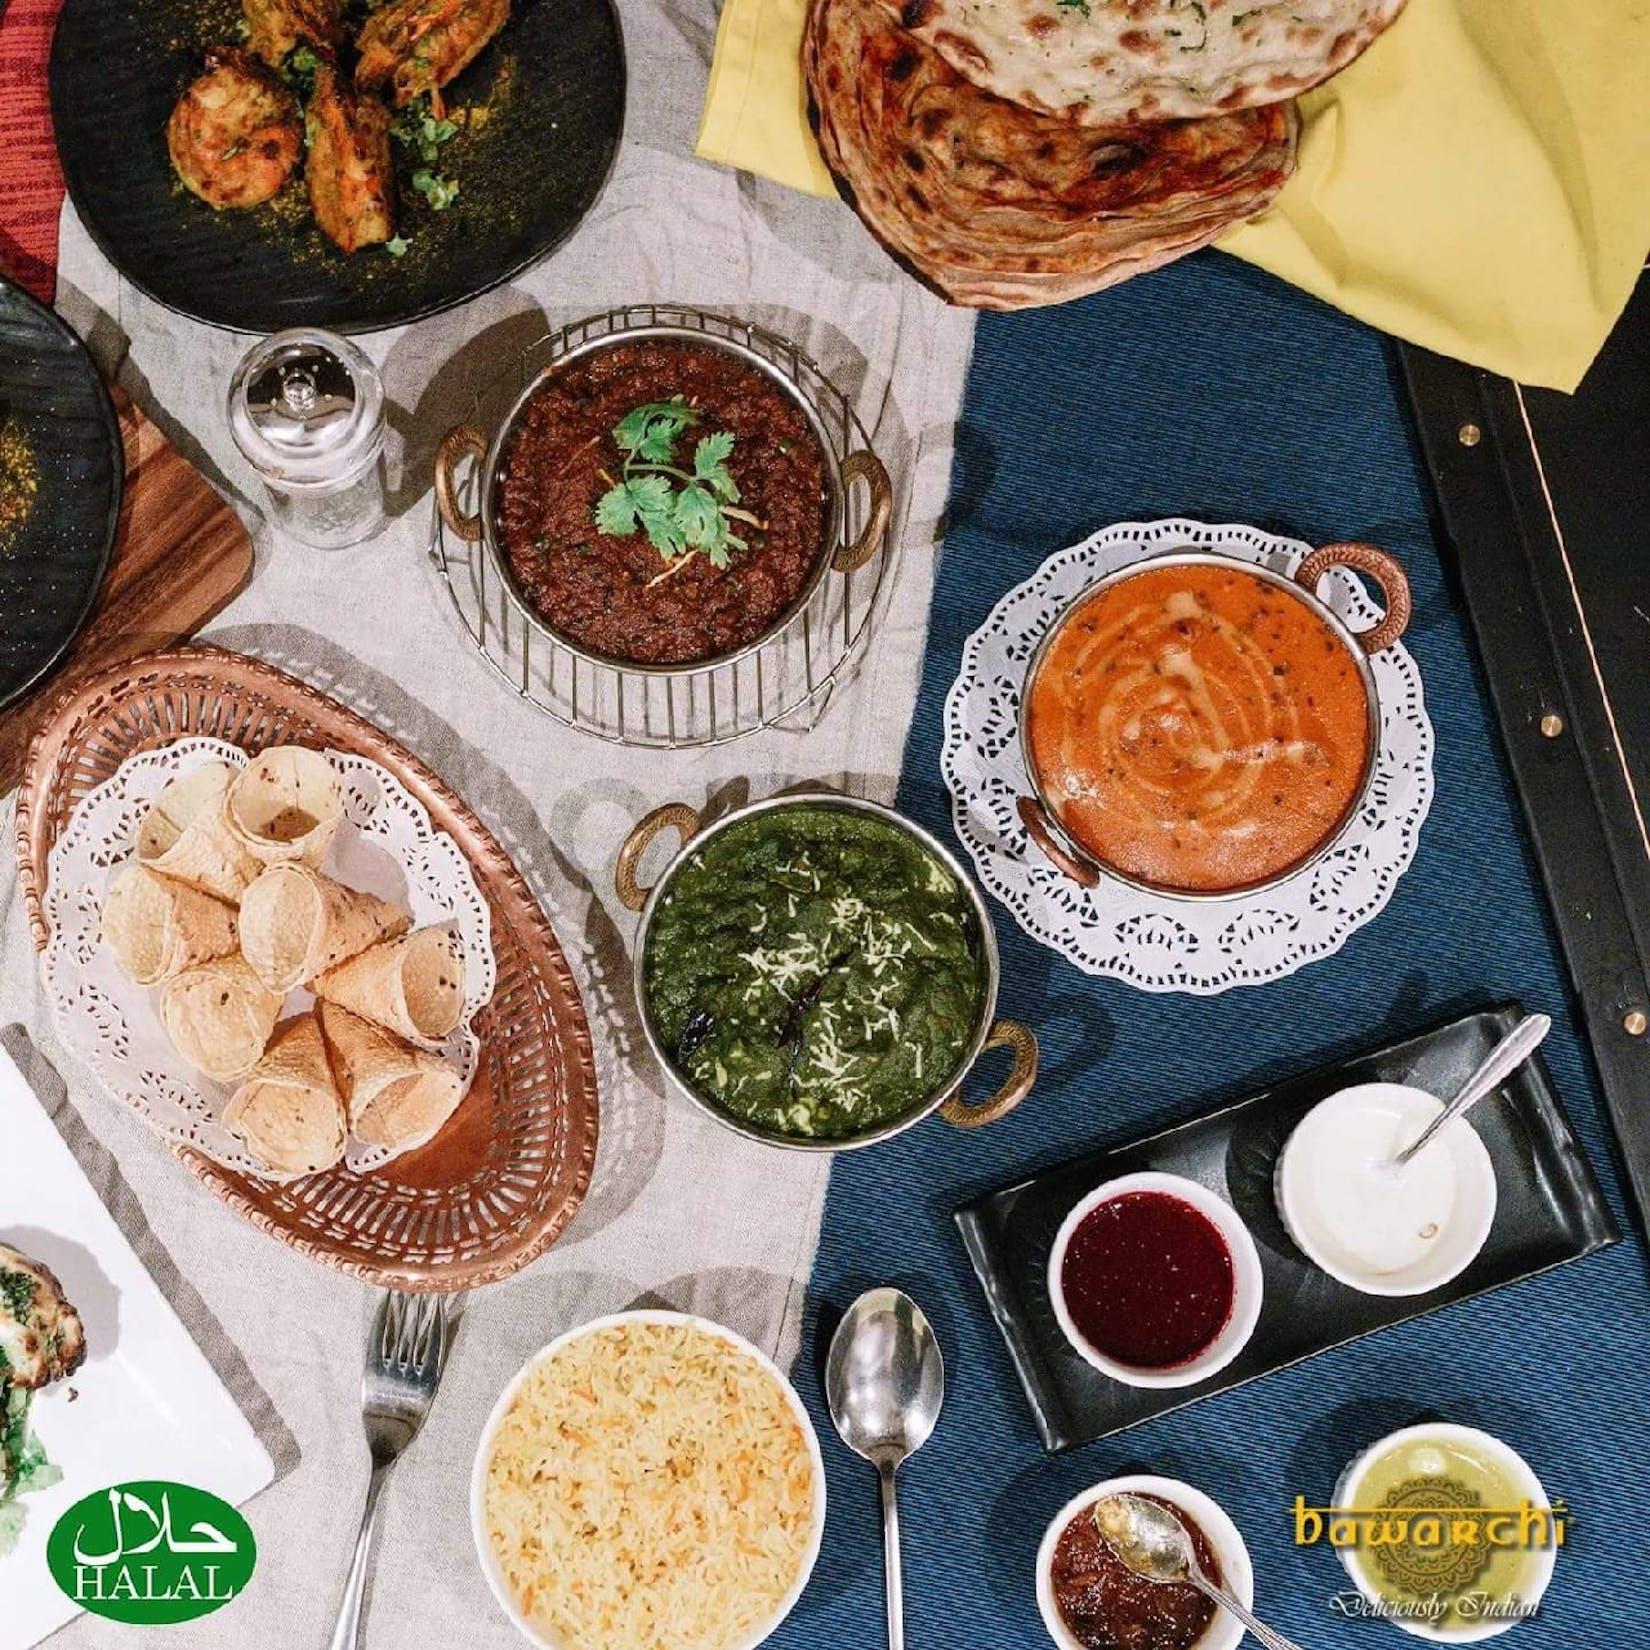 Bawarchi Indian Restaurant | yathar